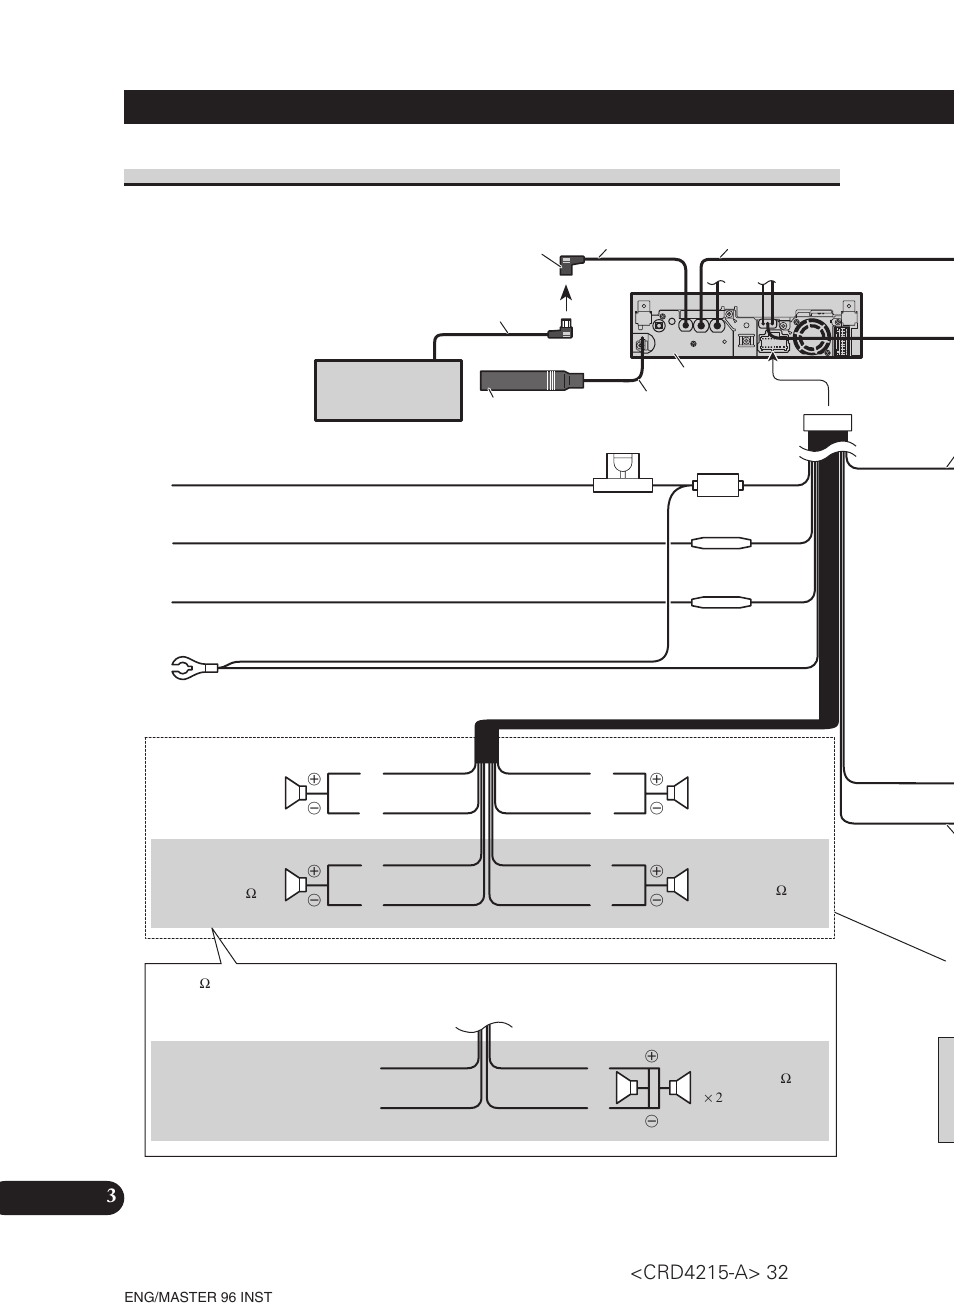 Tuner D Wiring Diagram On Wiring Diagram For Pioneer Super Tuner Iii